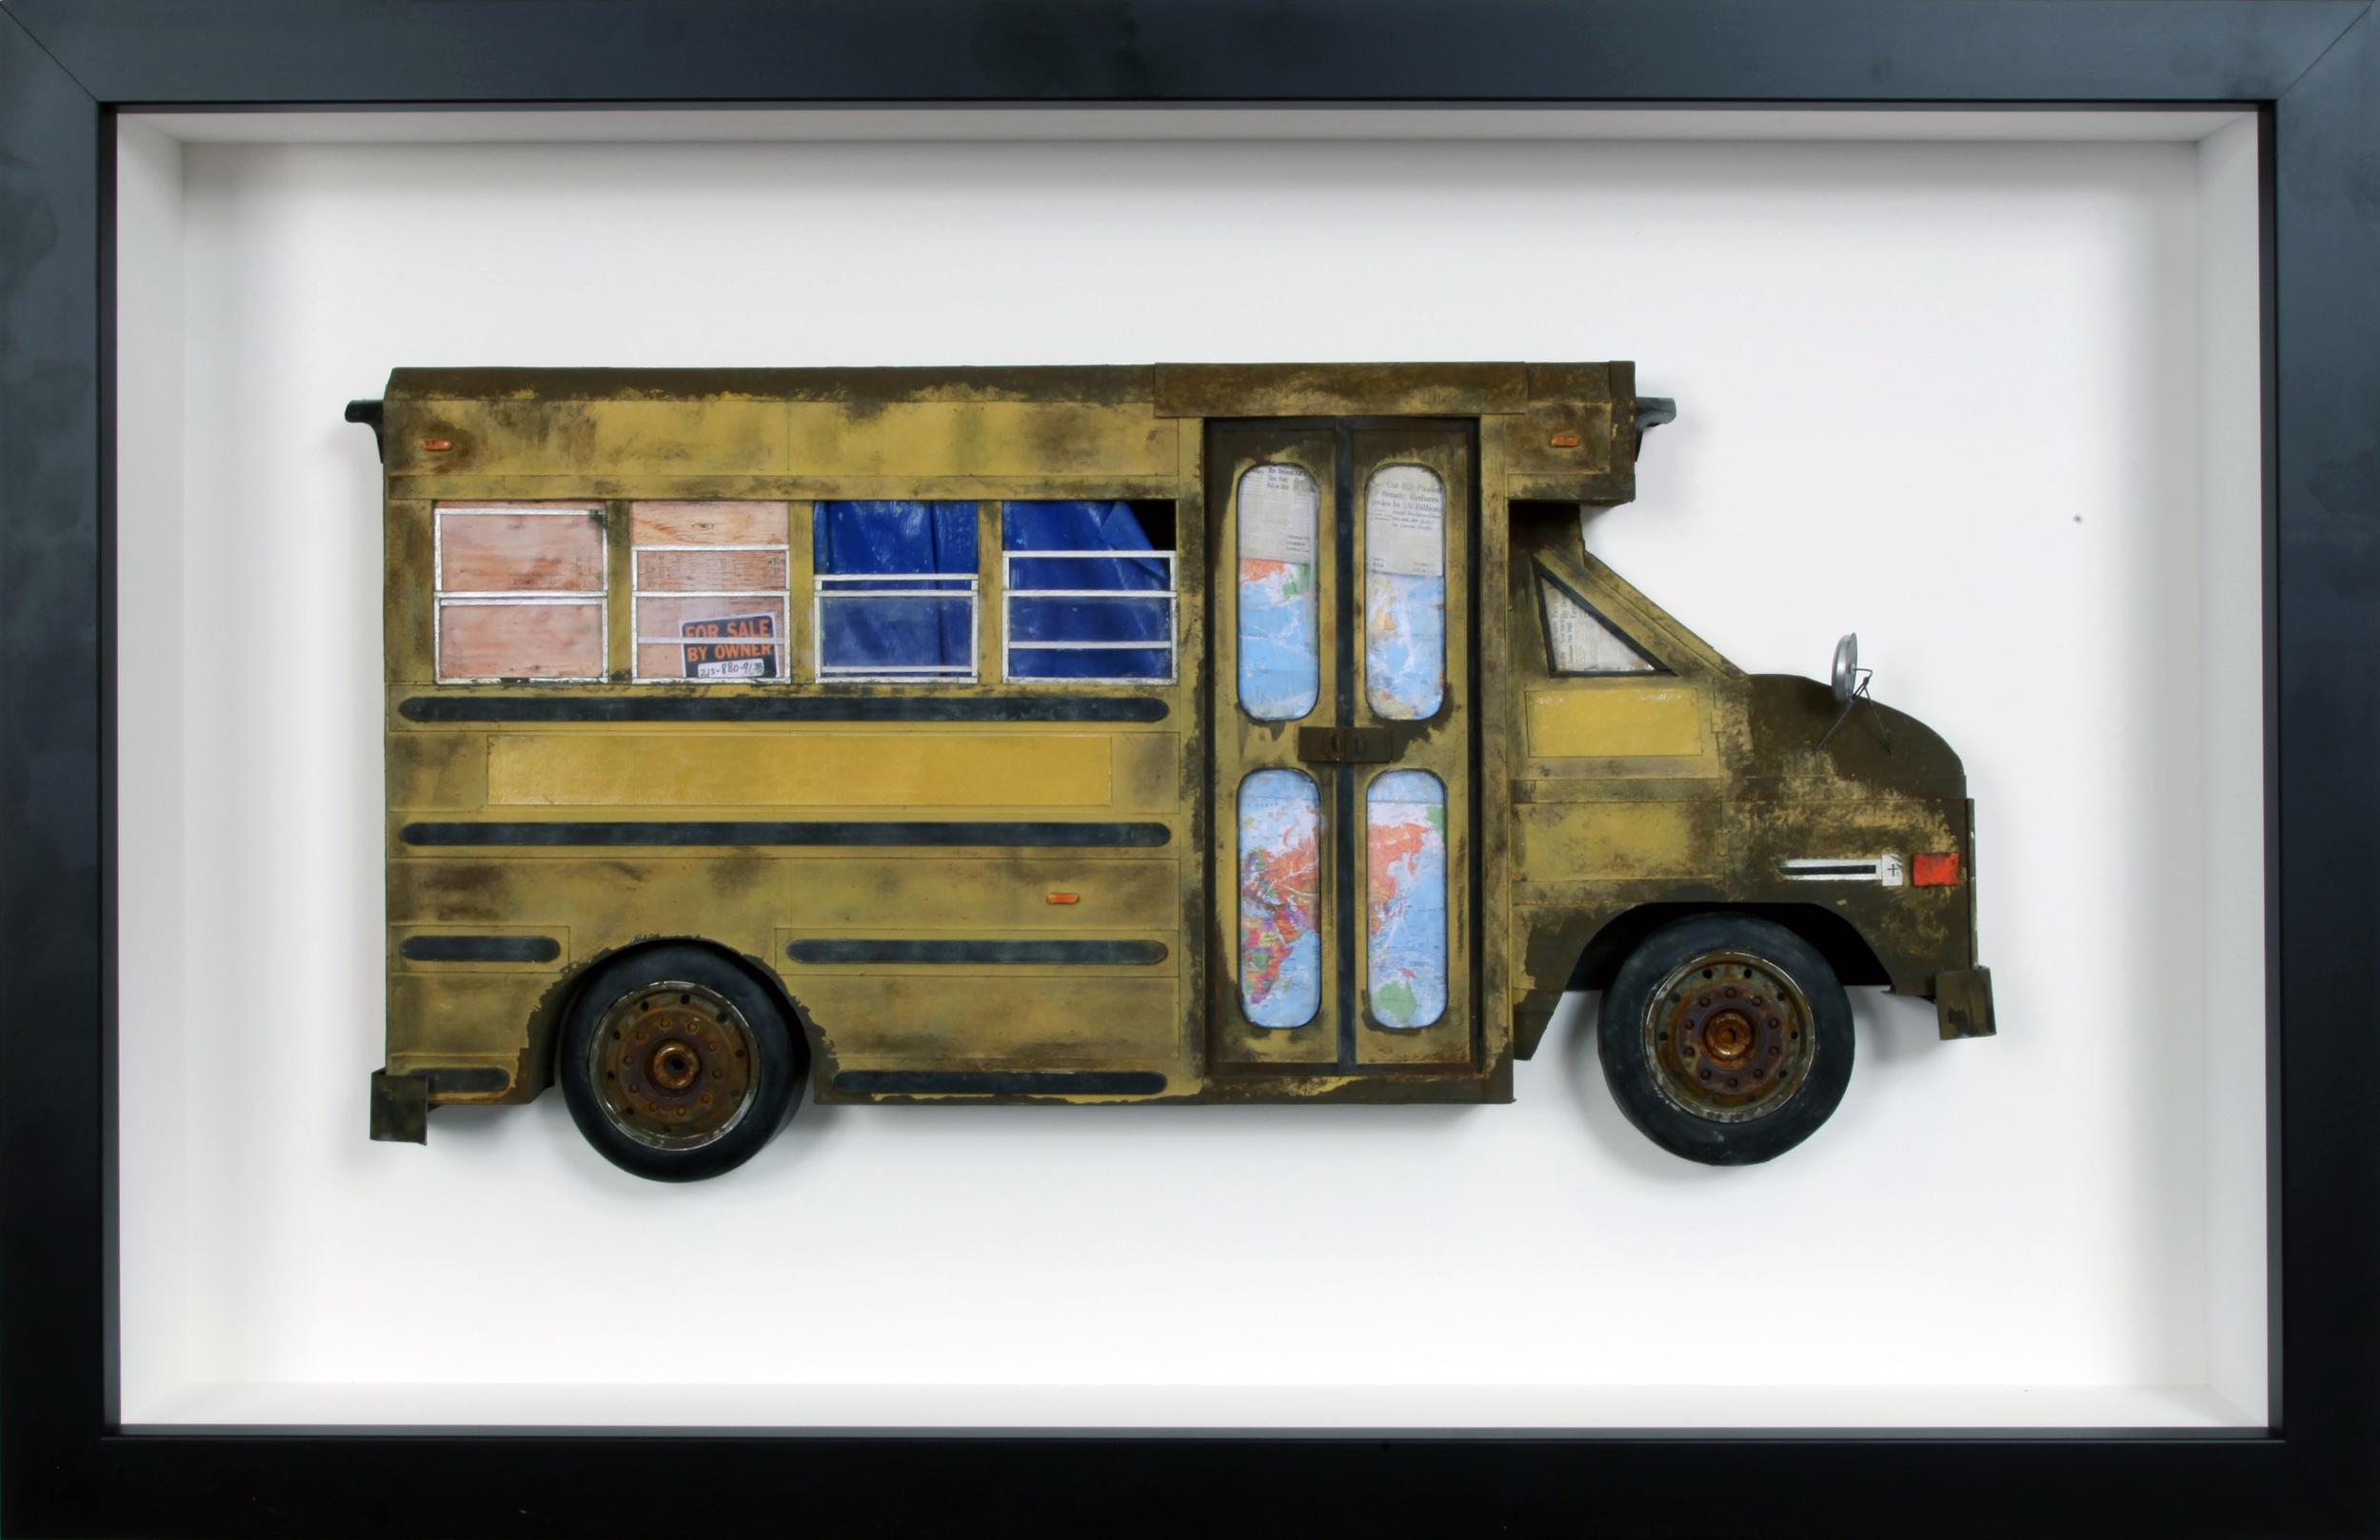 "Small School Bus - 16"" x 24 5/8"" - SOLD"